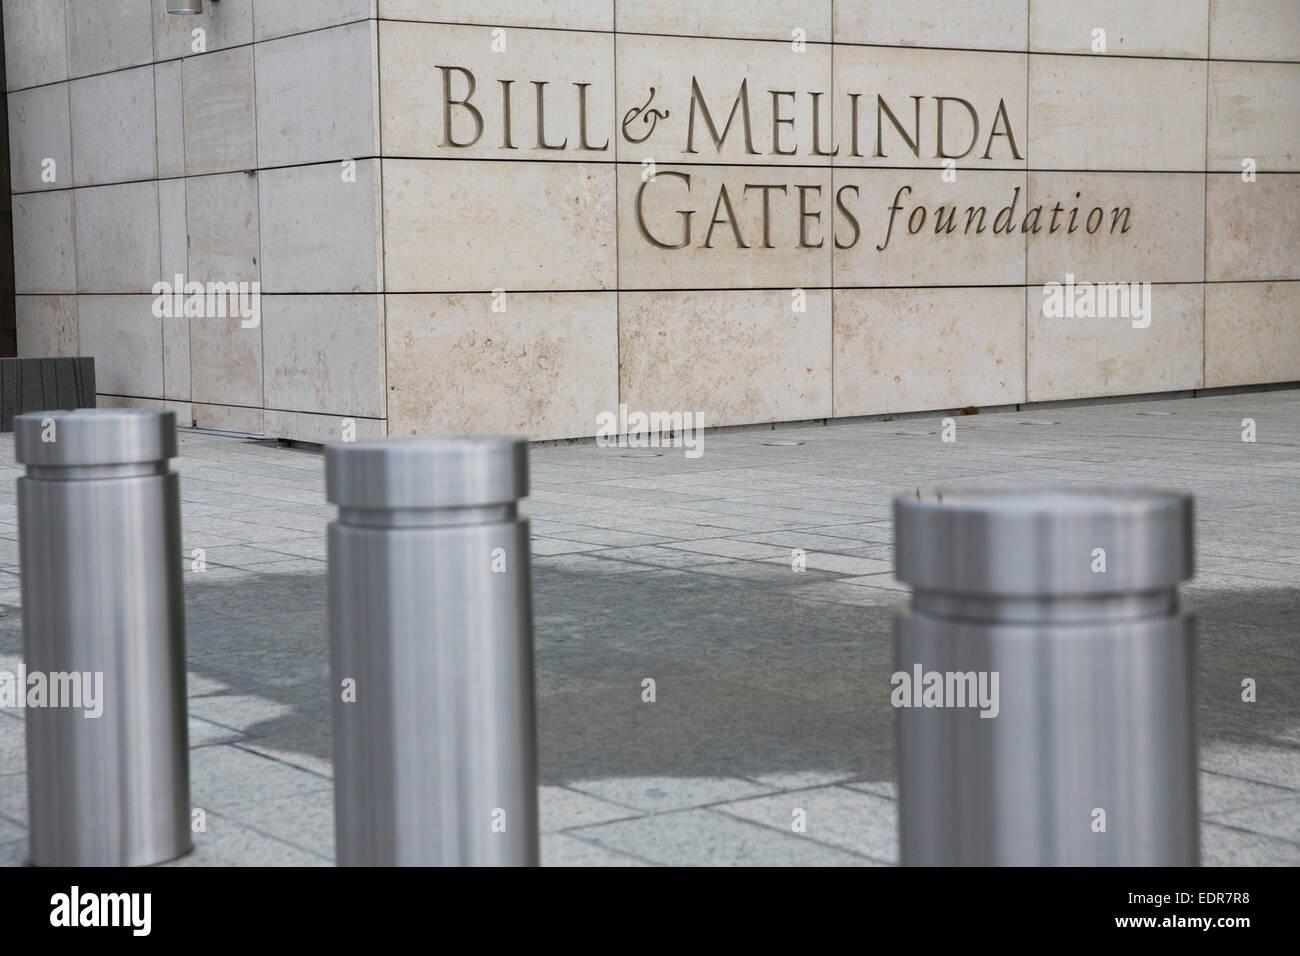 The headquarters of the Bill & Melinda Gates Foundation in Seattle, Washington. - Stock Image